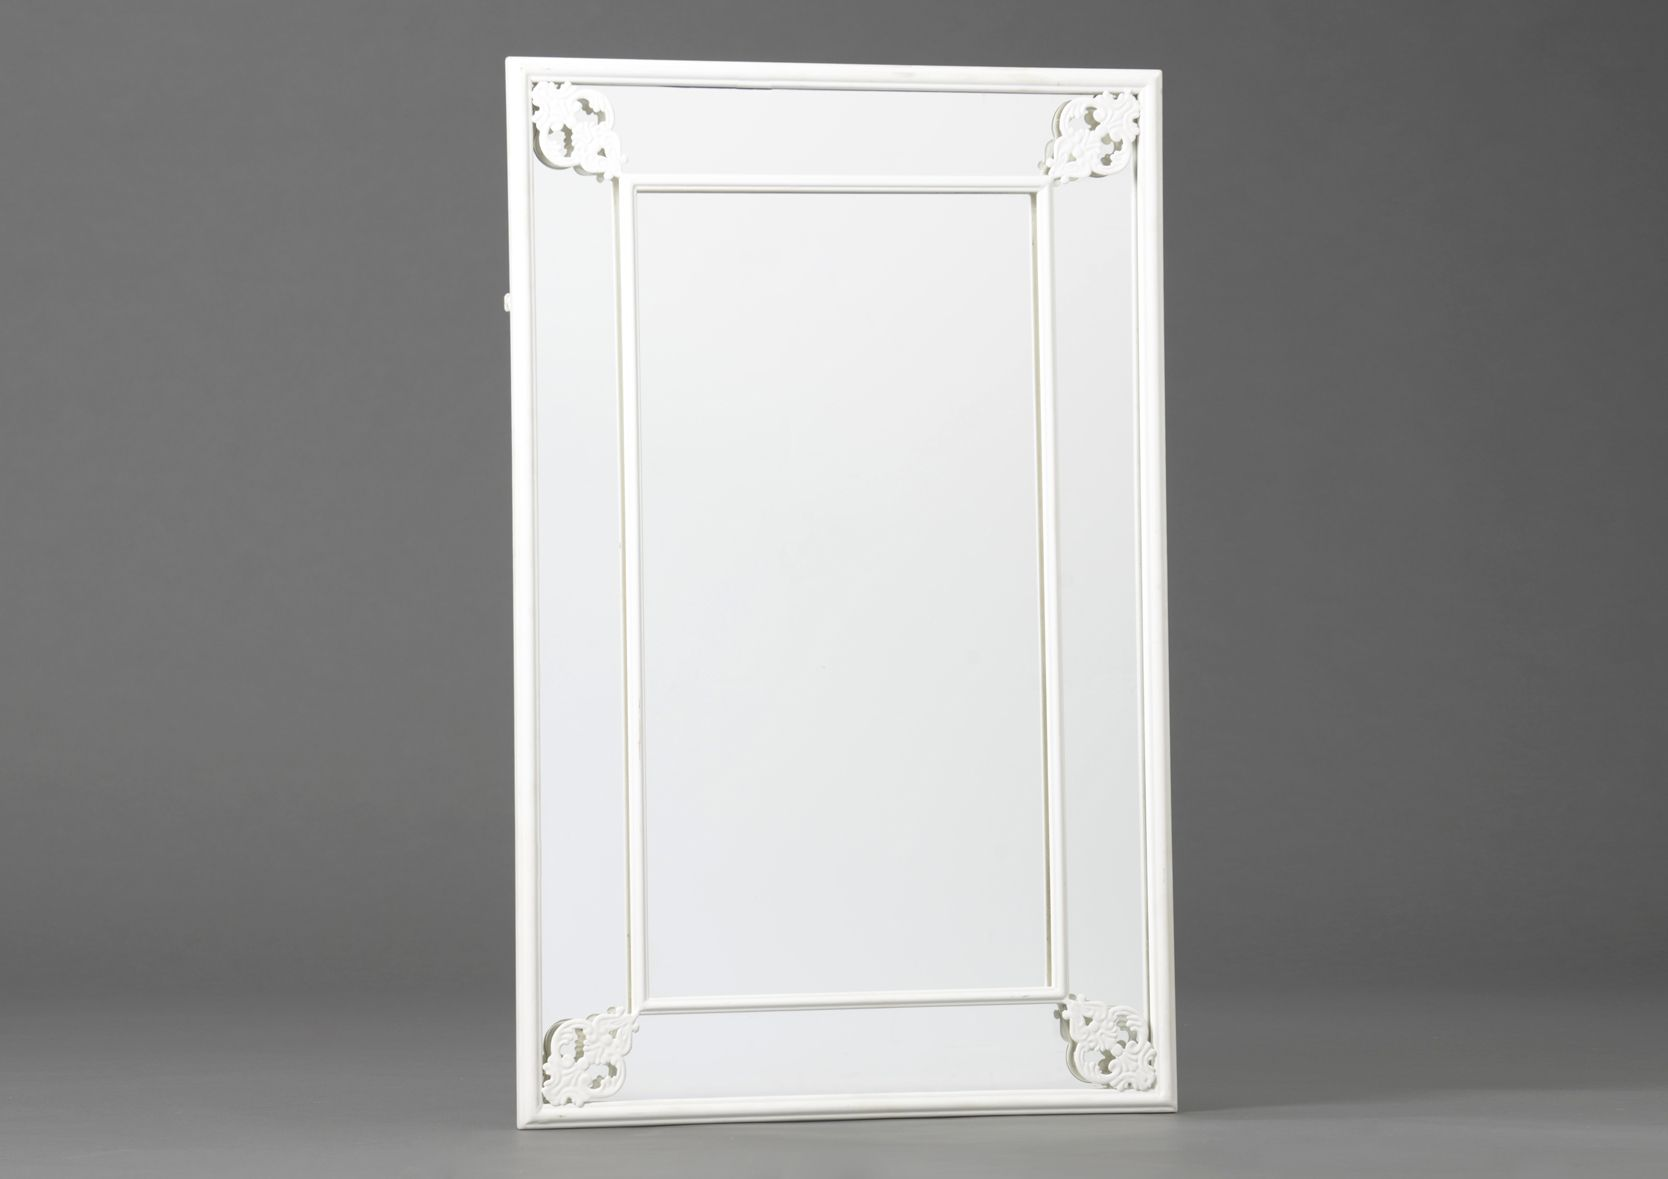 miroir m tal blanc 55x86cm. Black Bedroom Furniture Sets. Home Design Ideas